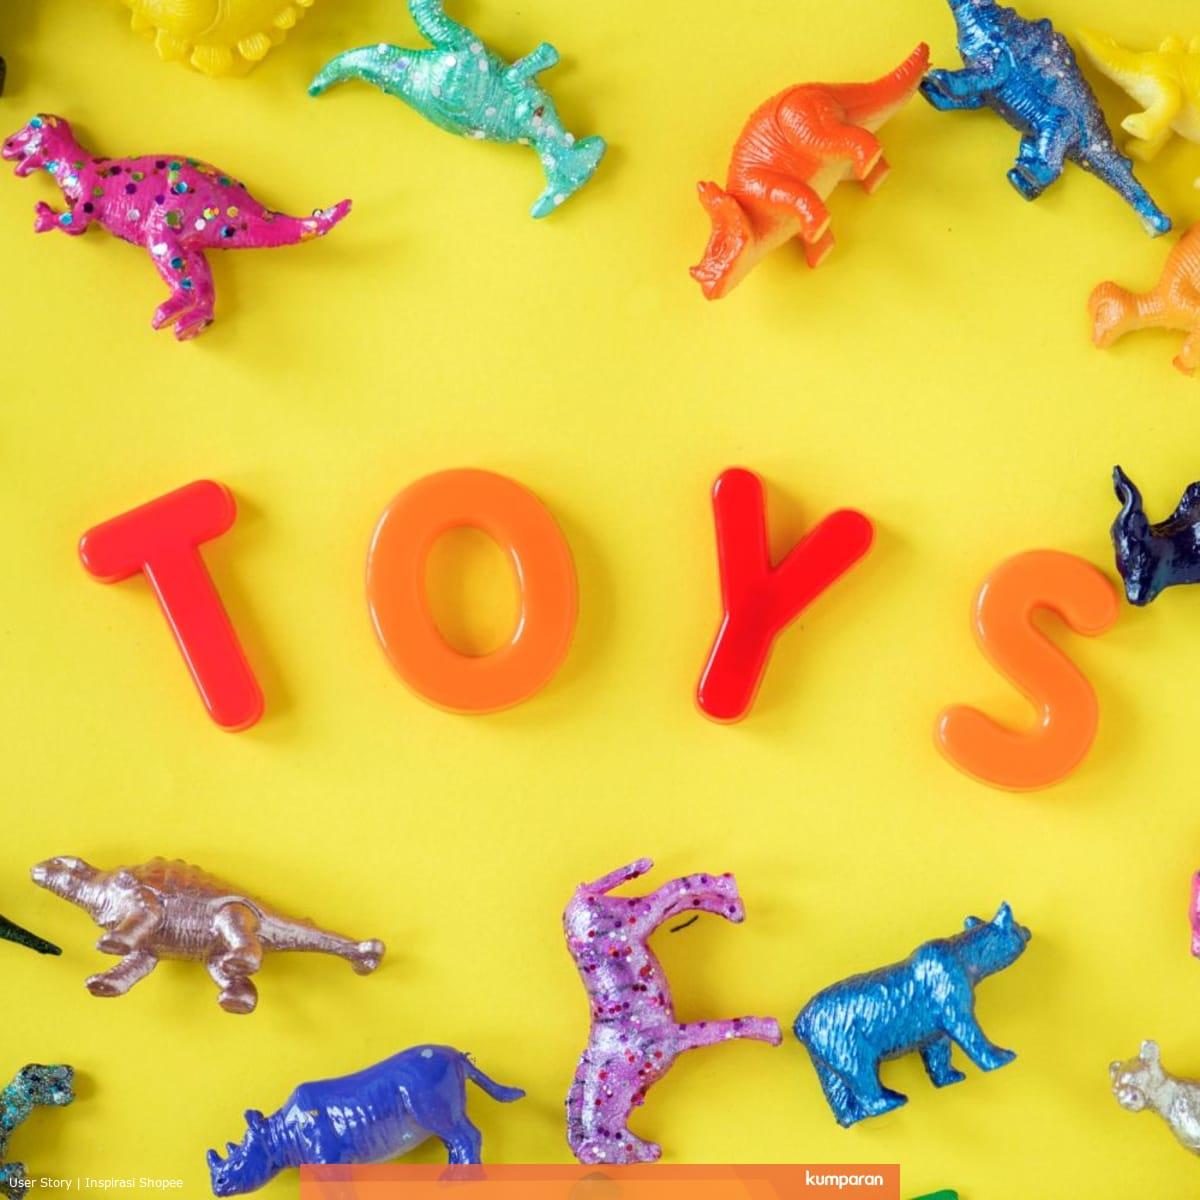 5 Mainan Paling Viral Sepanjang Tahun 2018 Masih Punya